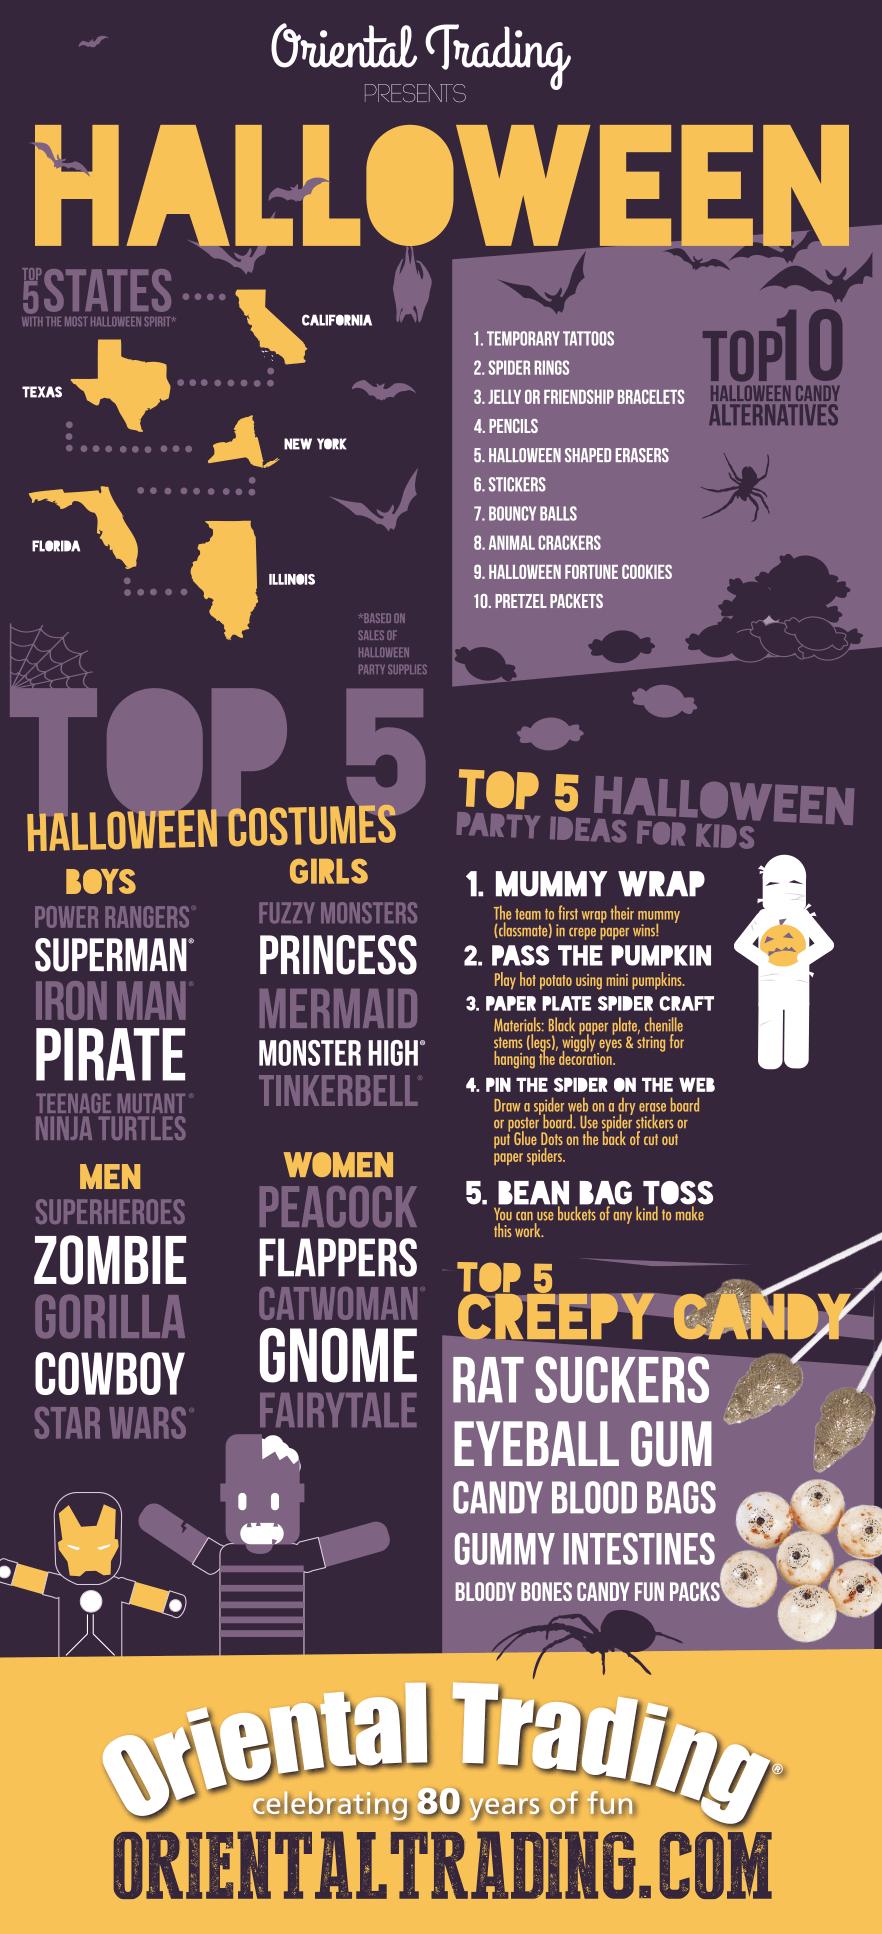 halloween fun facts & ghoulishly good ideasorientaltrading